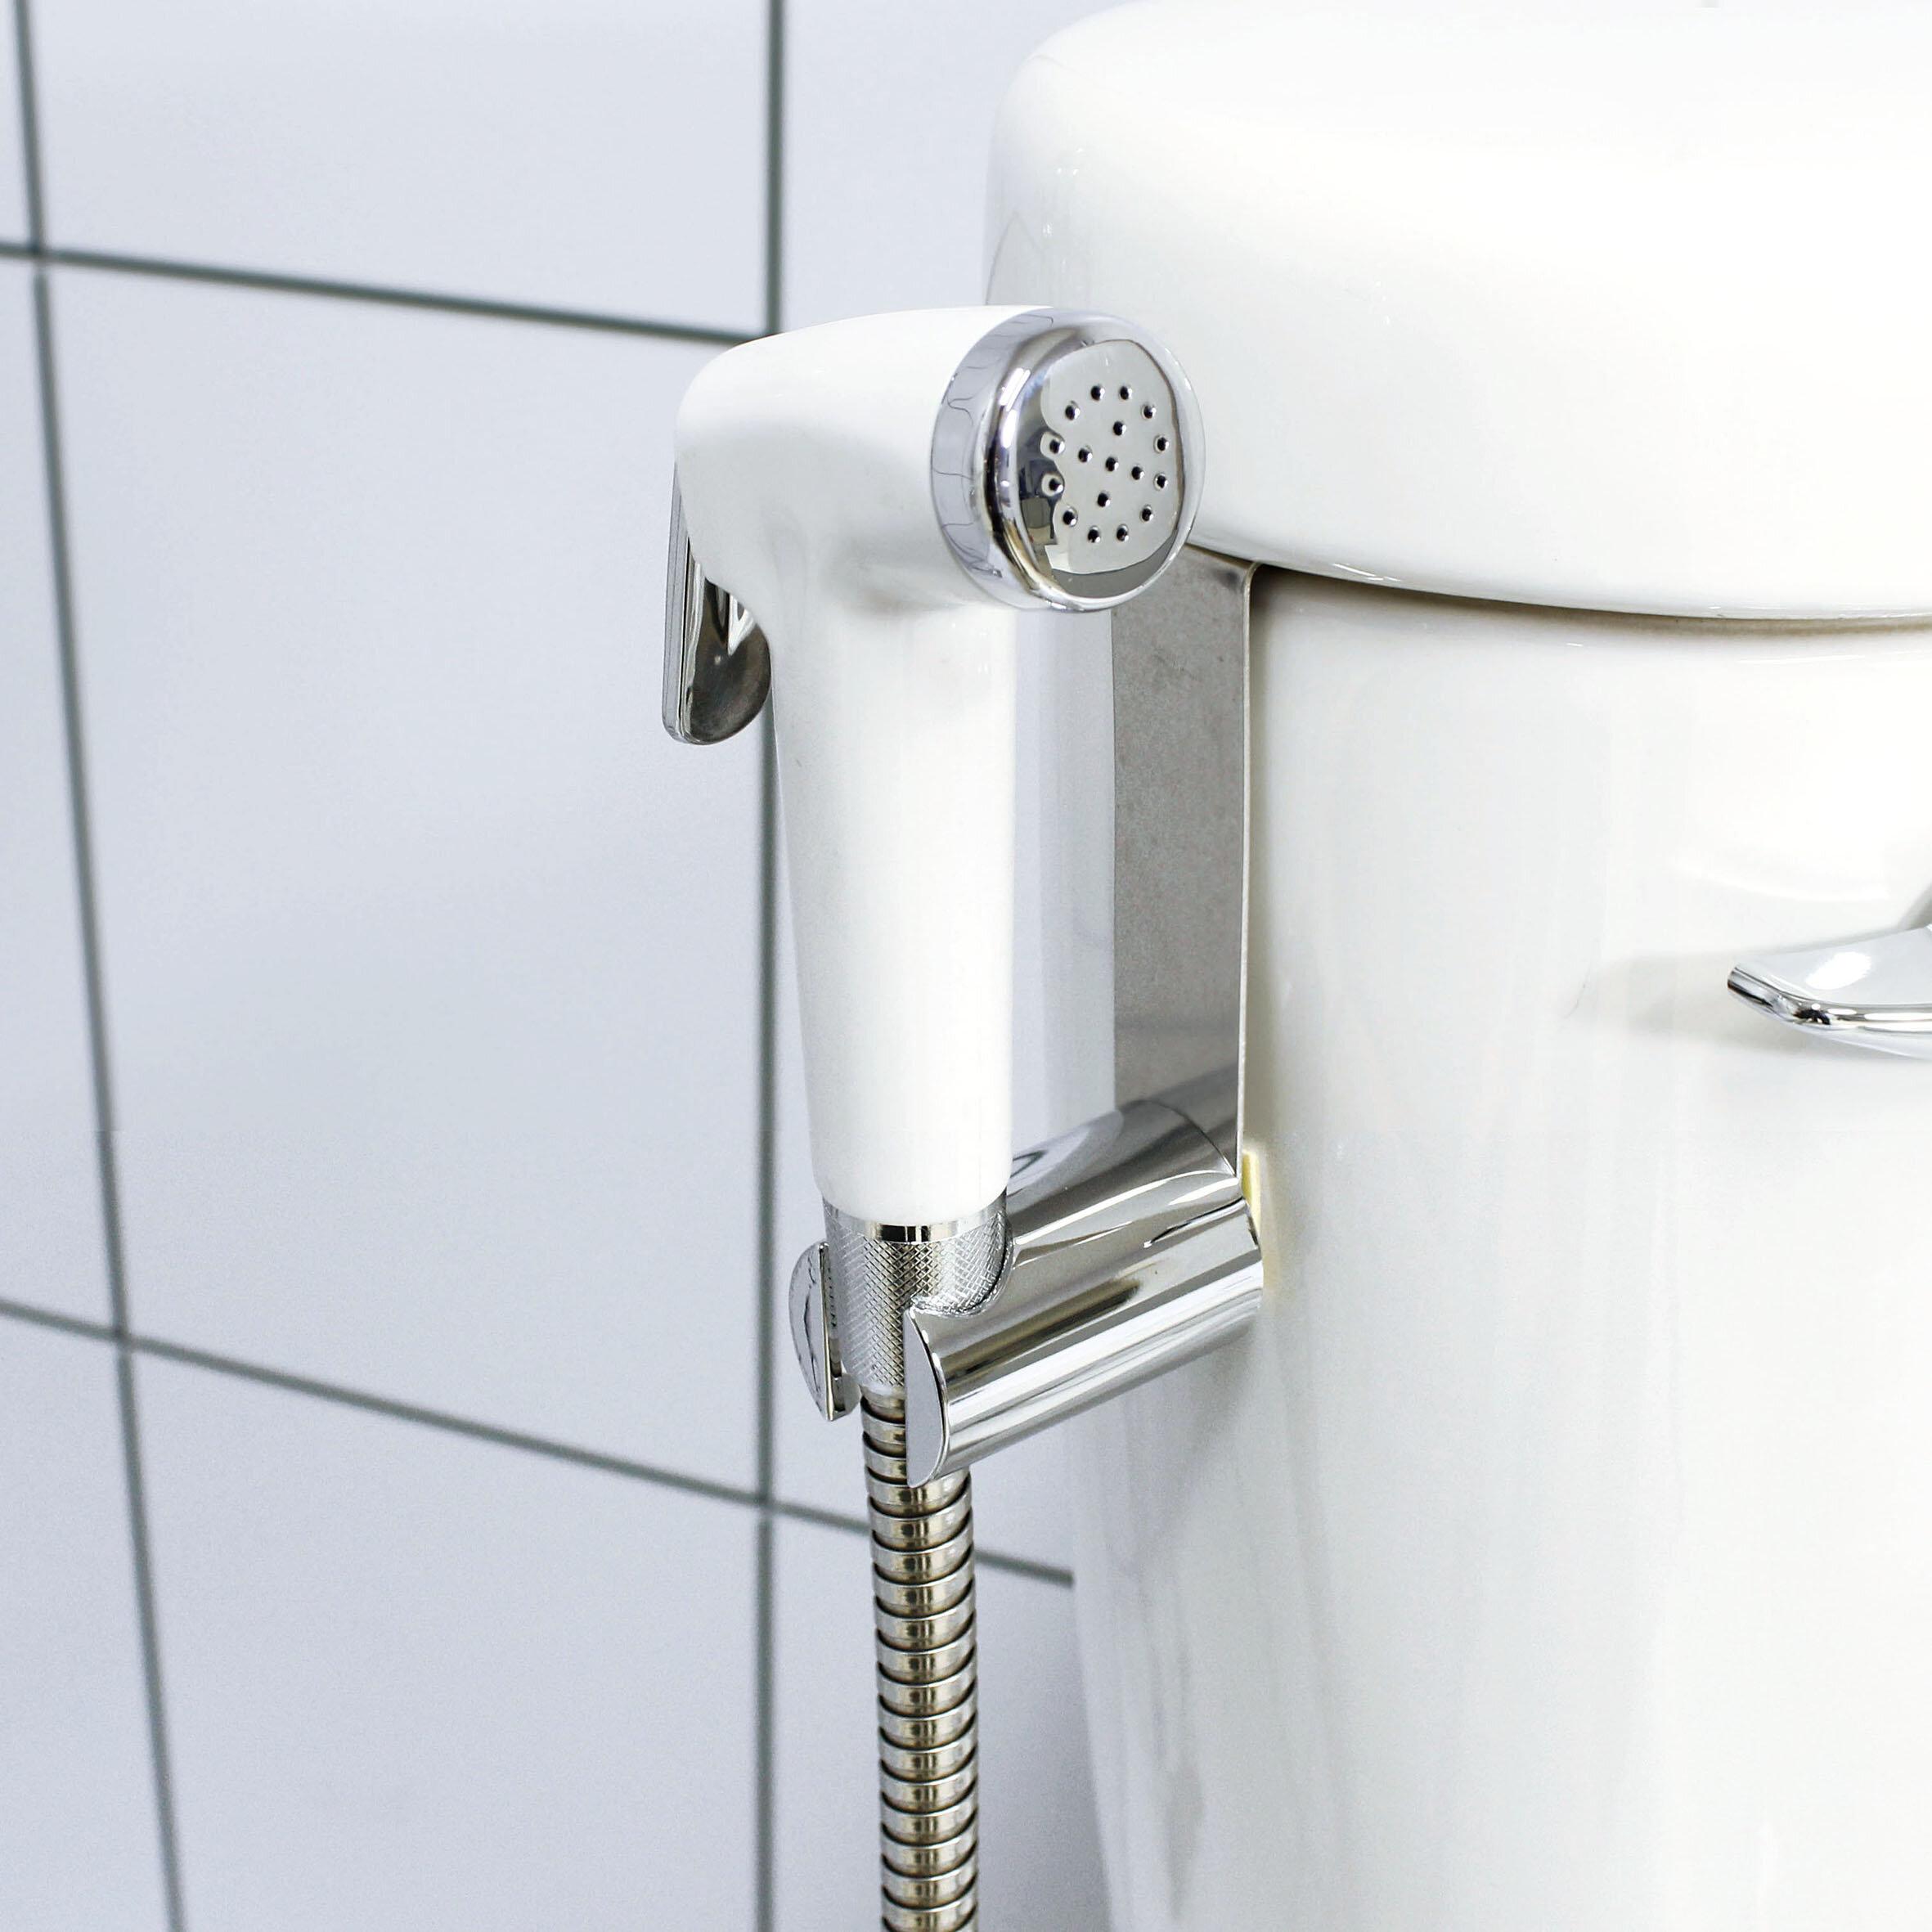 Premium Warm Water Diaper Sprayer And Bidet Accessory